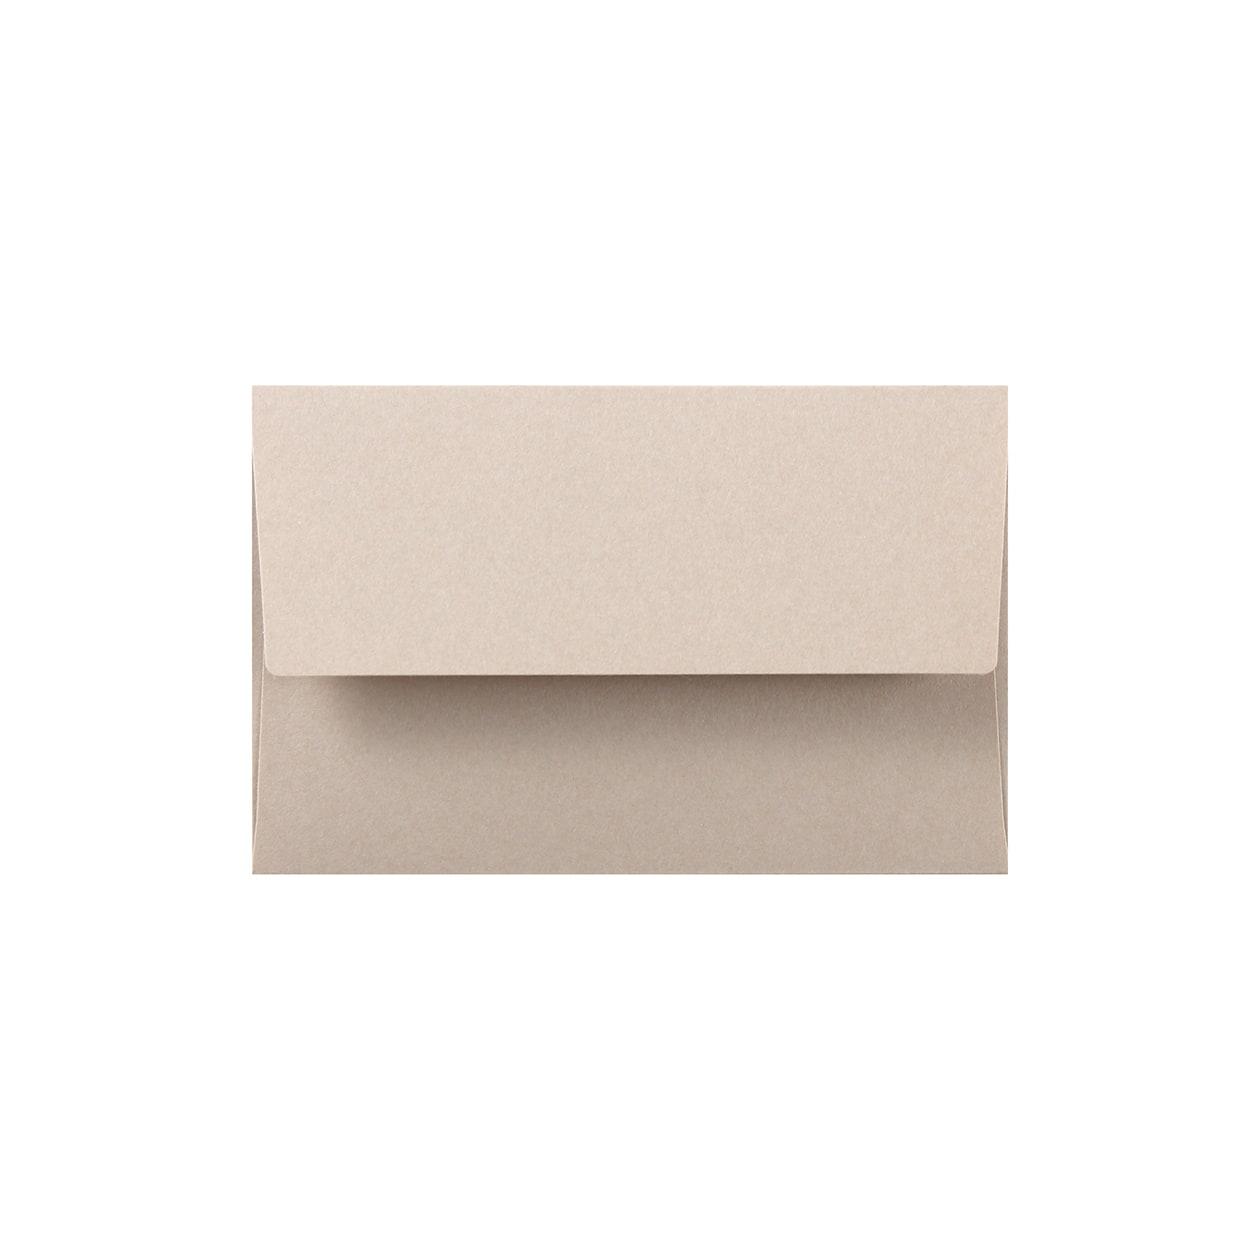 NEカマス封筒 コットン(NTラシャ) 鼠 116.3g